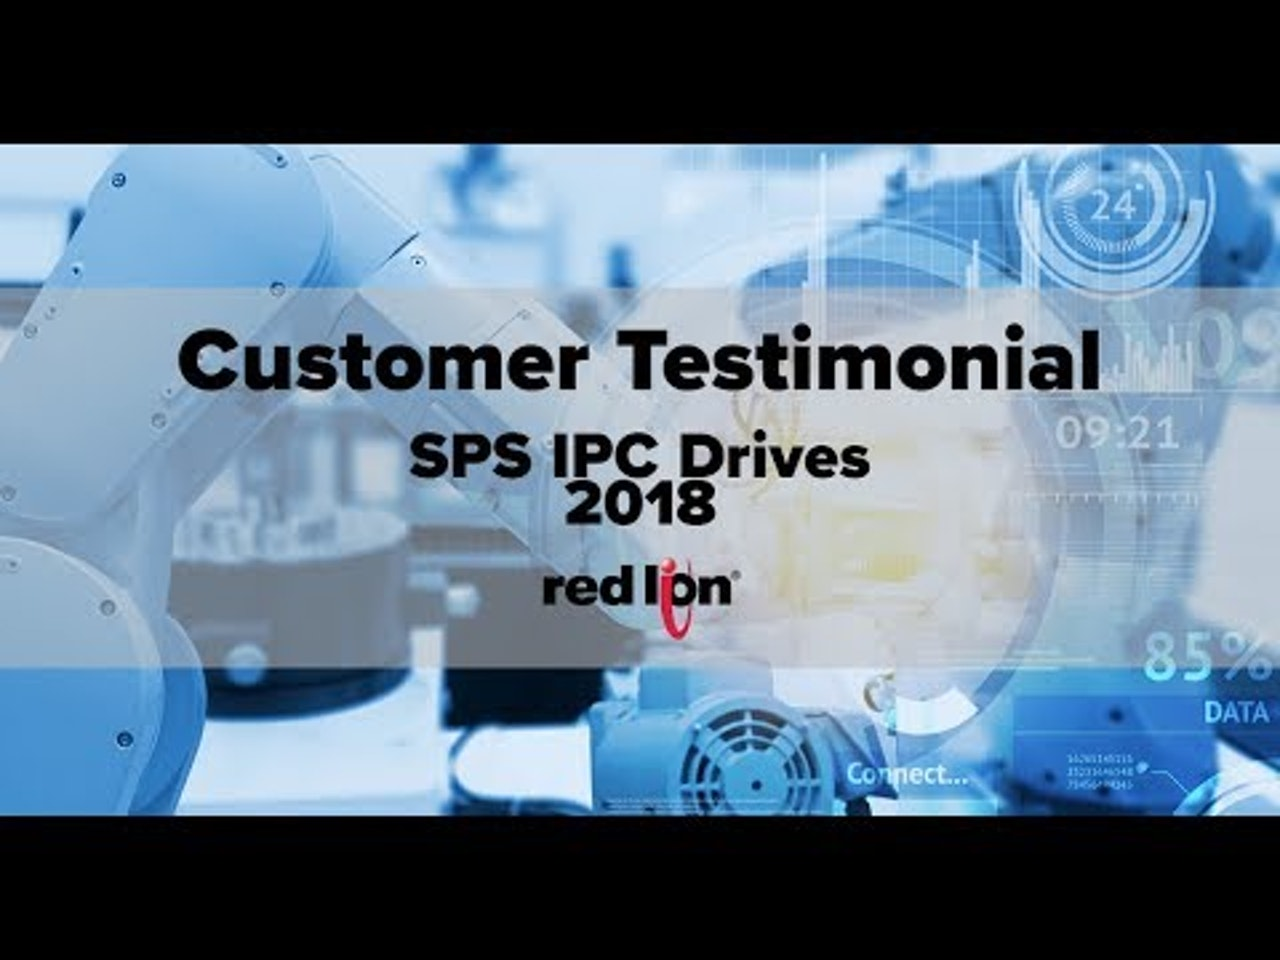 Customer Testimonials from SPS IPC Drives - Reliste, GmbH